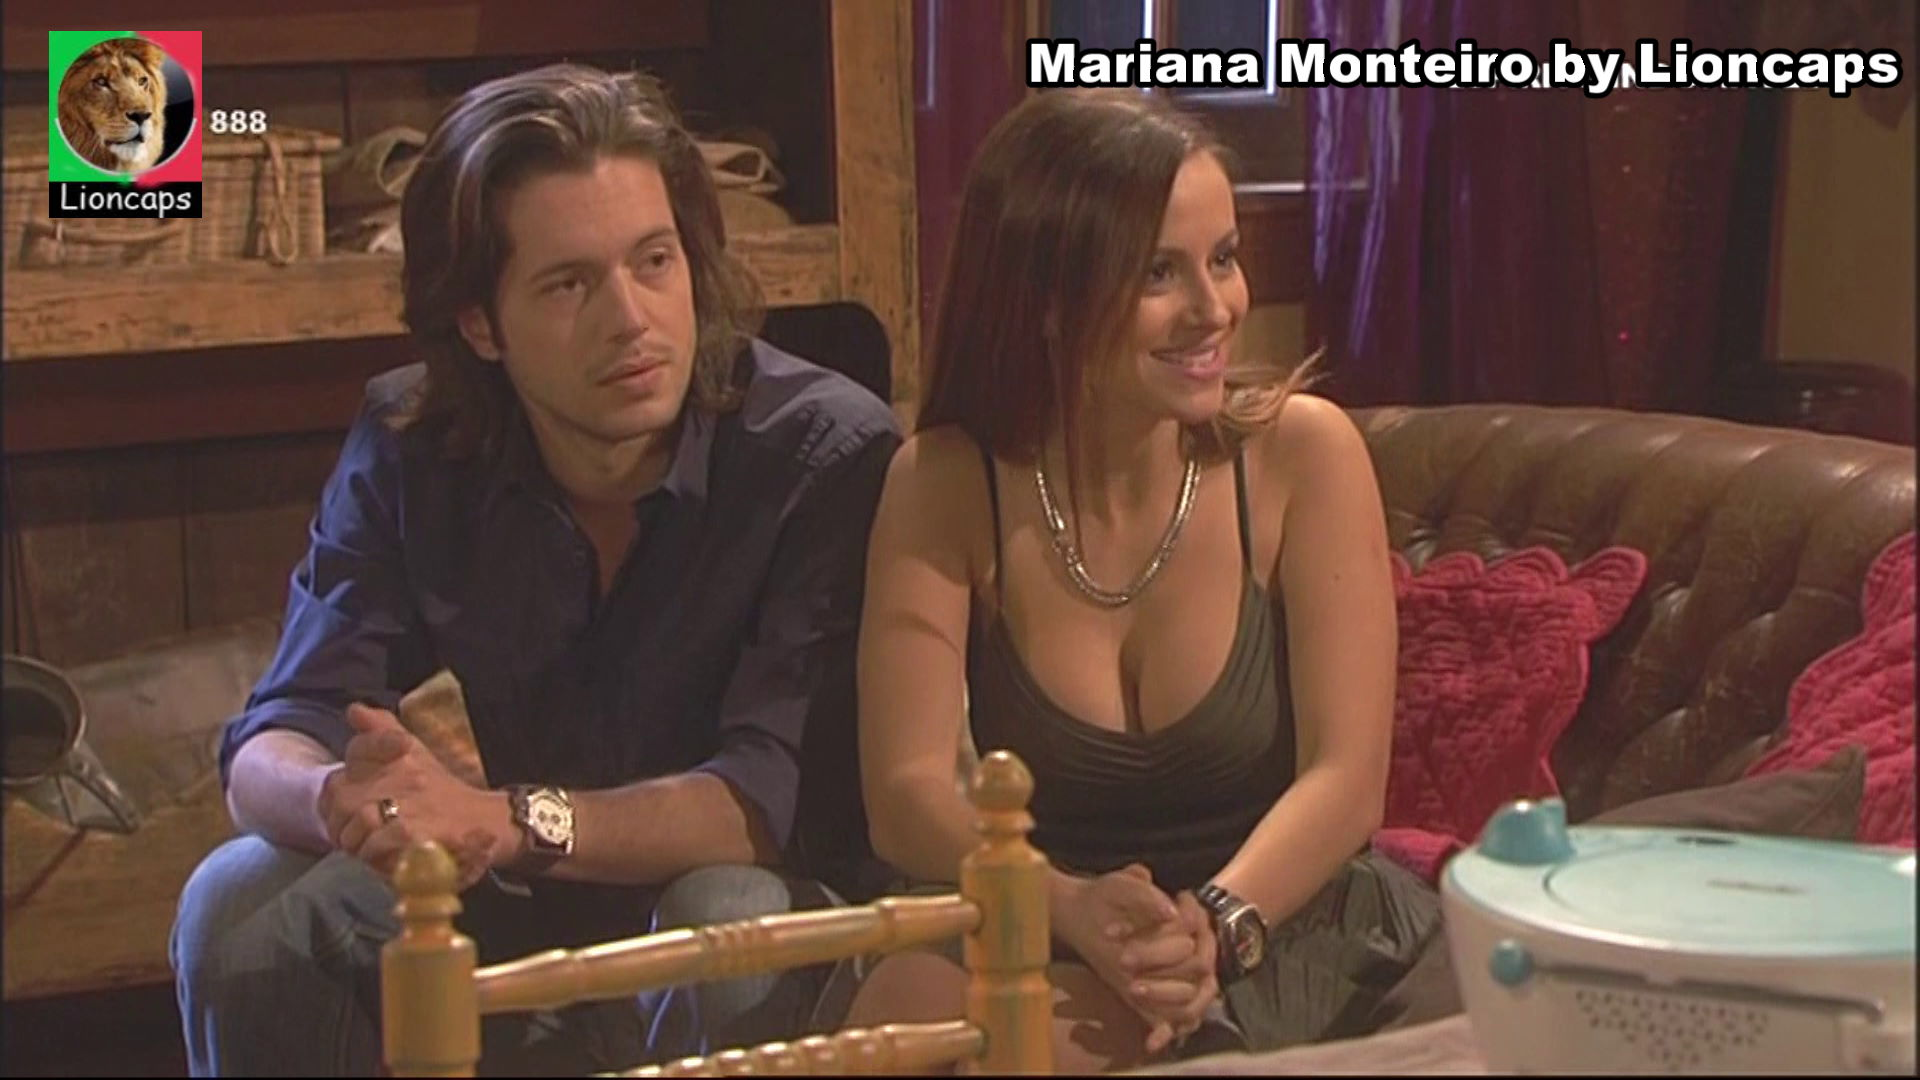 738386141_mariana_monteiro_vs190209_19216_122_524lo.JPG